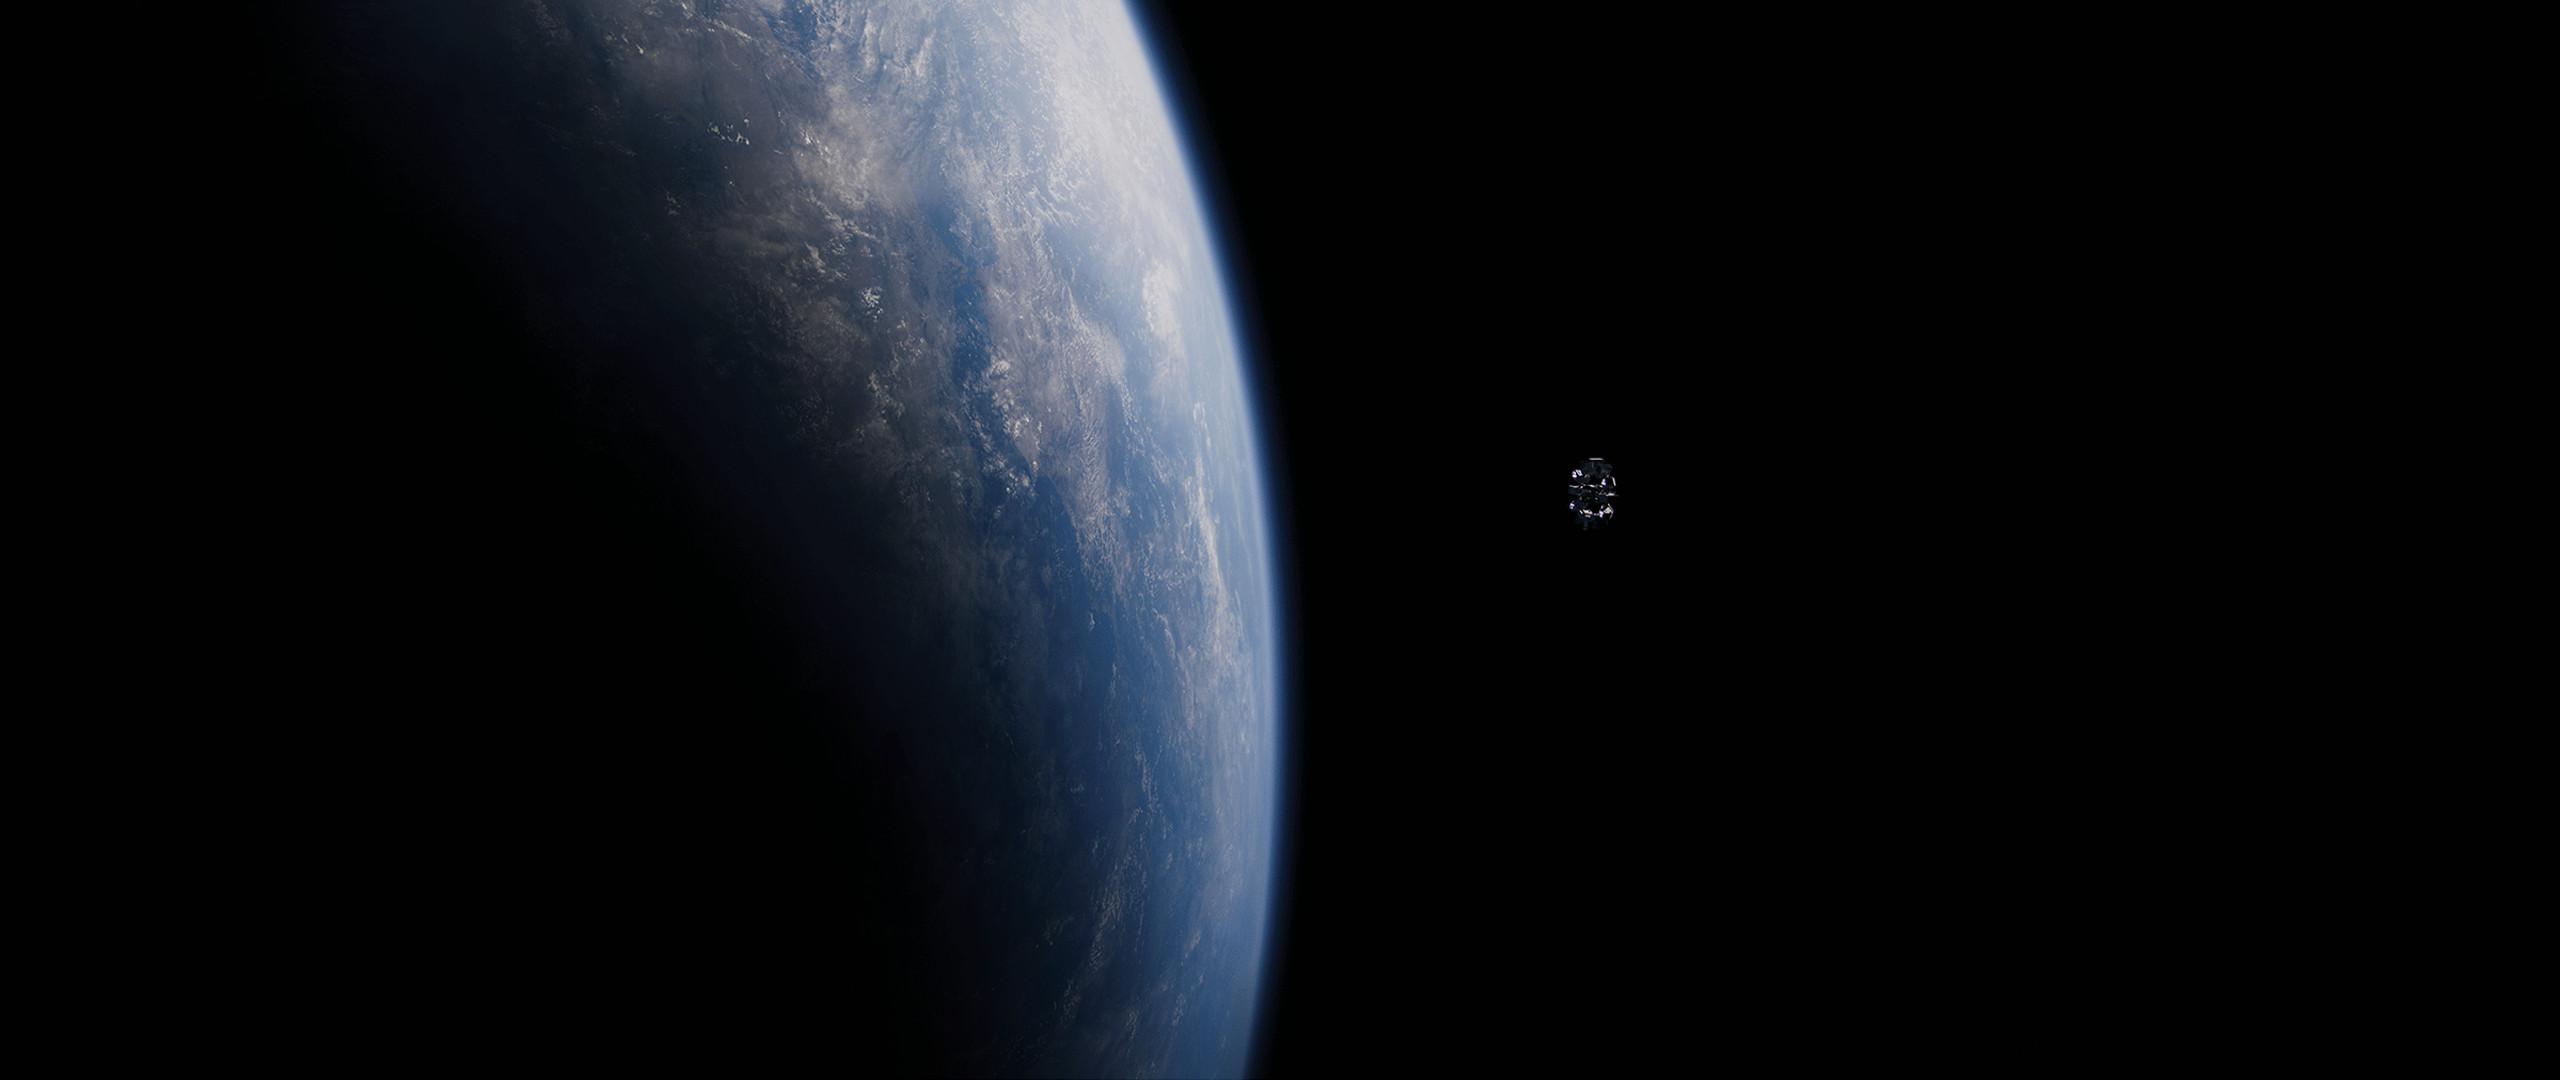 Interstellar Wallpaper Earth by ABAthedude Interstellar Wallpaper Earth by  ABAthedude